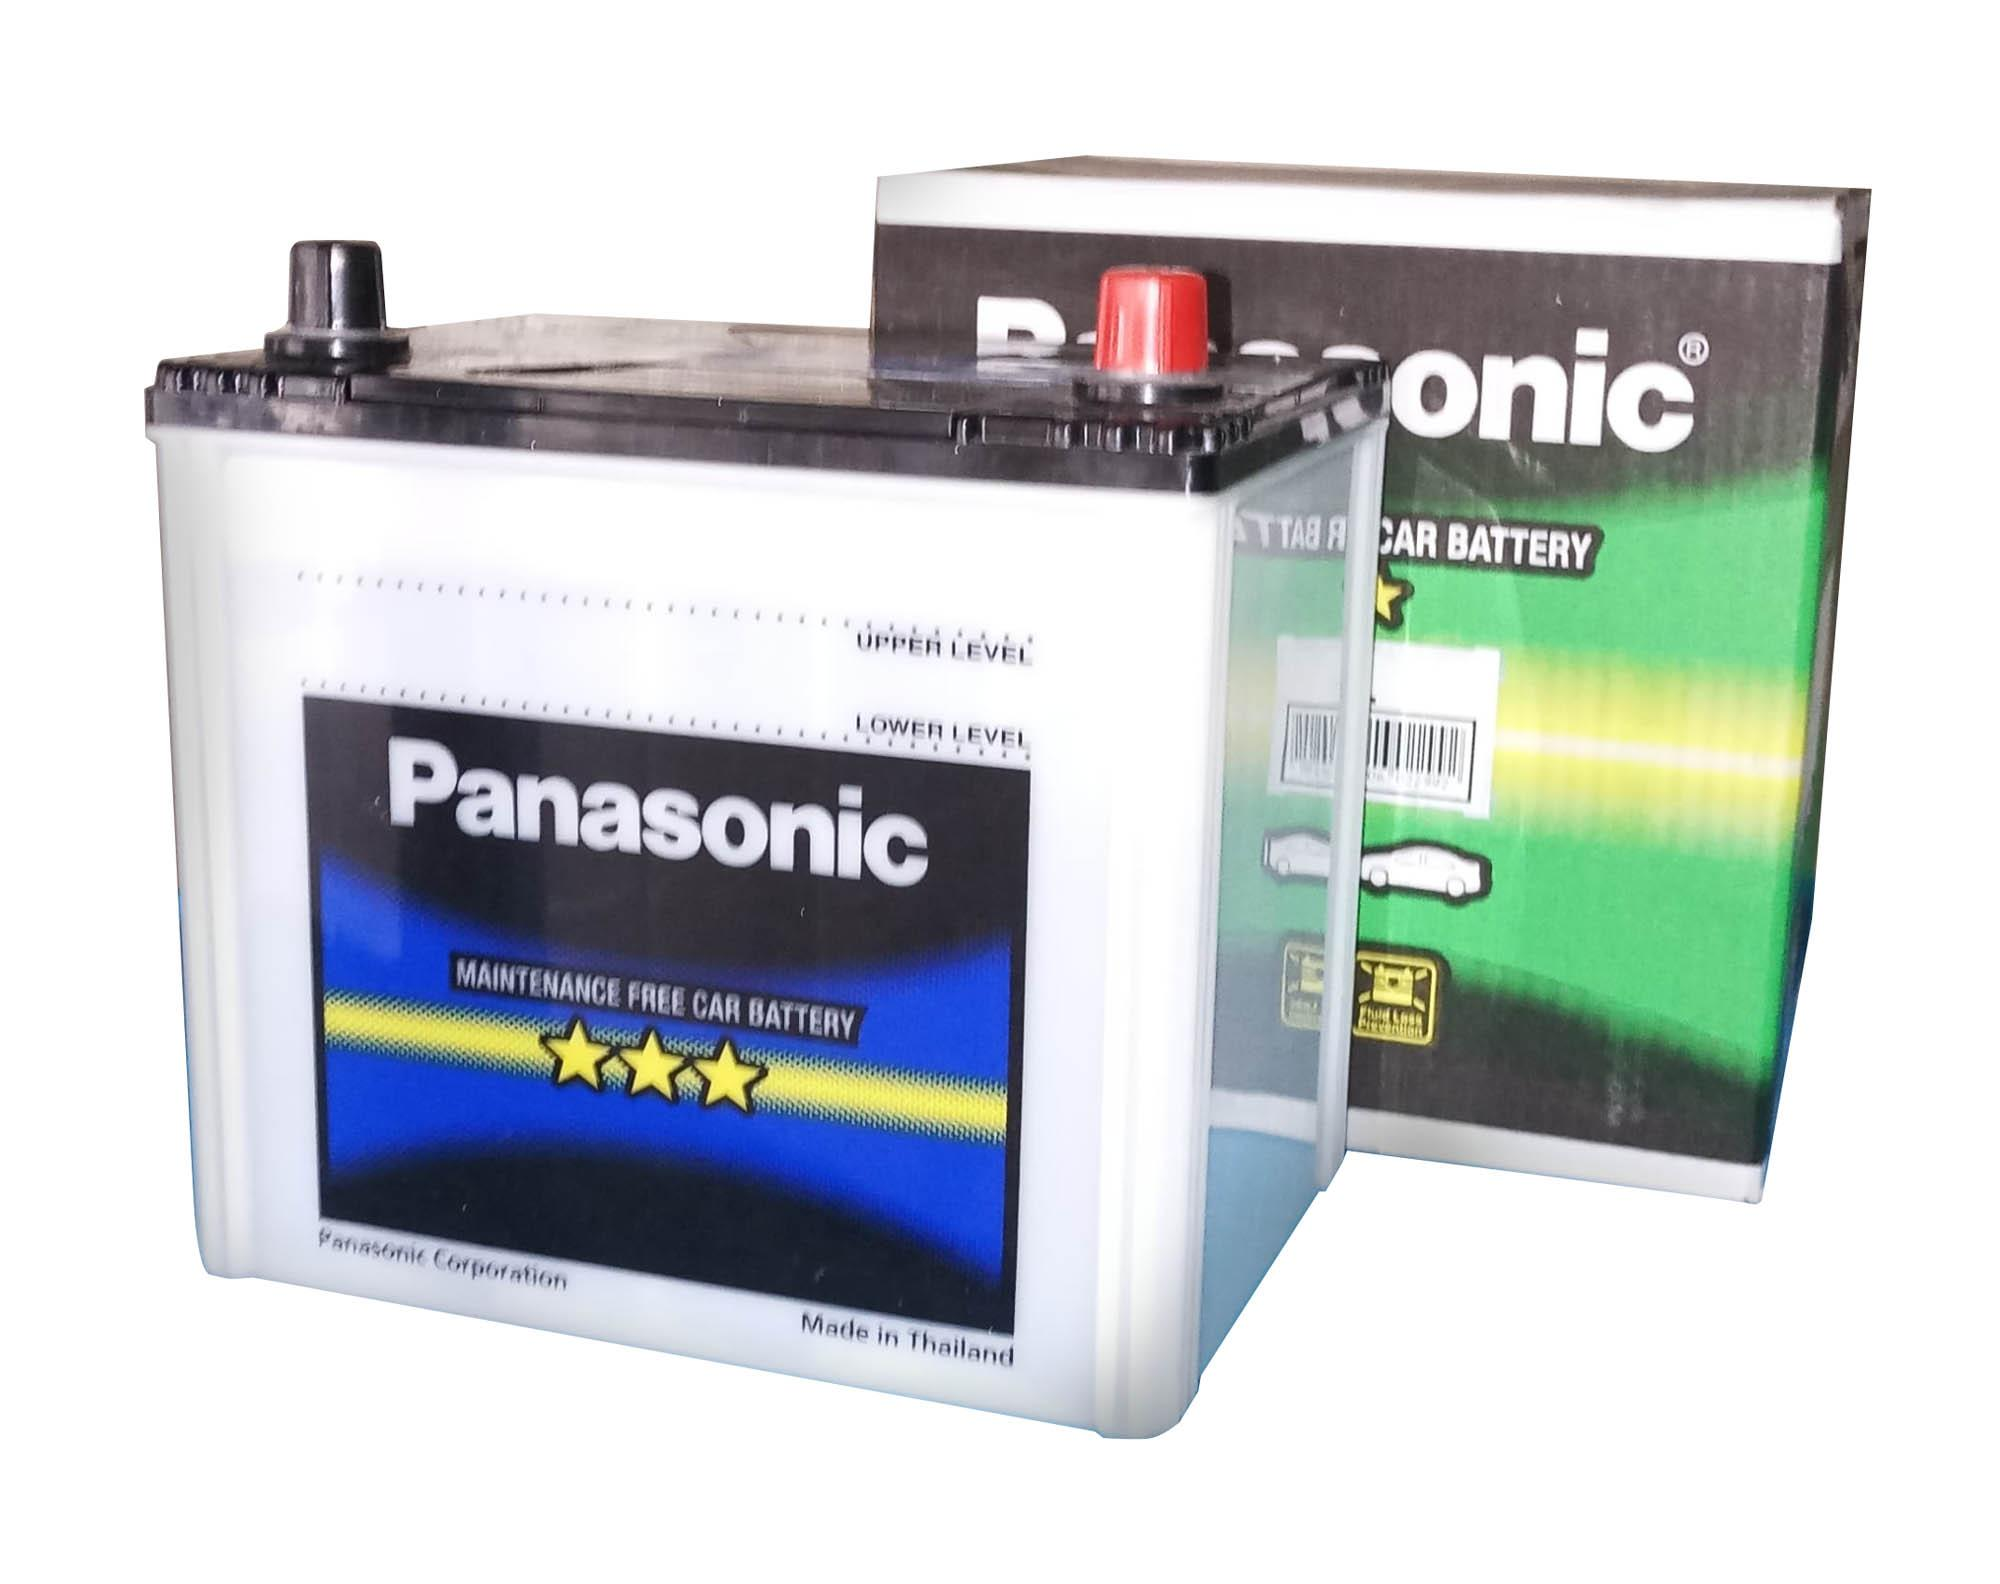 Buy Panasonic Batteries Online | lazada.com.ph